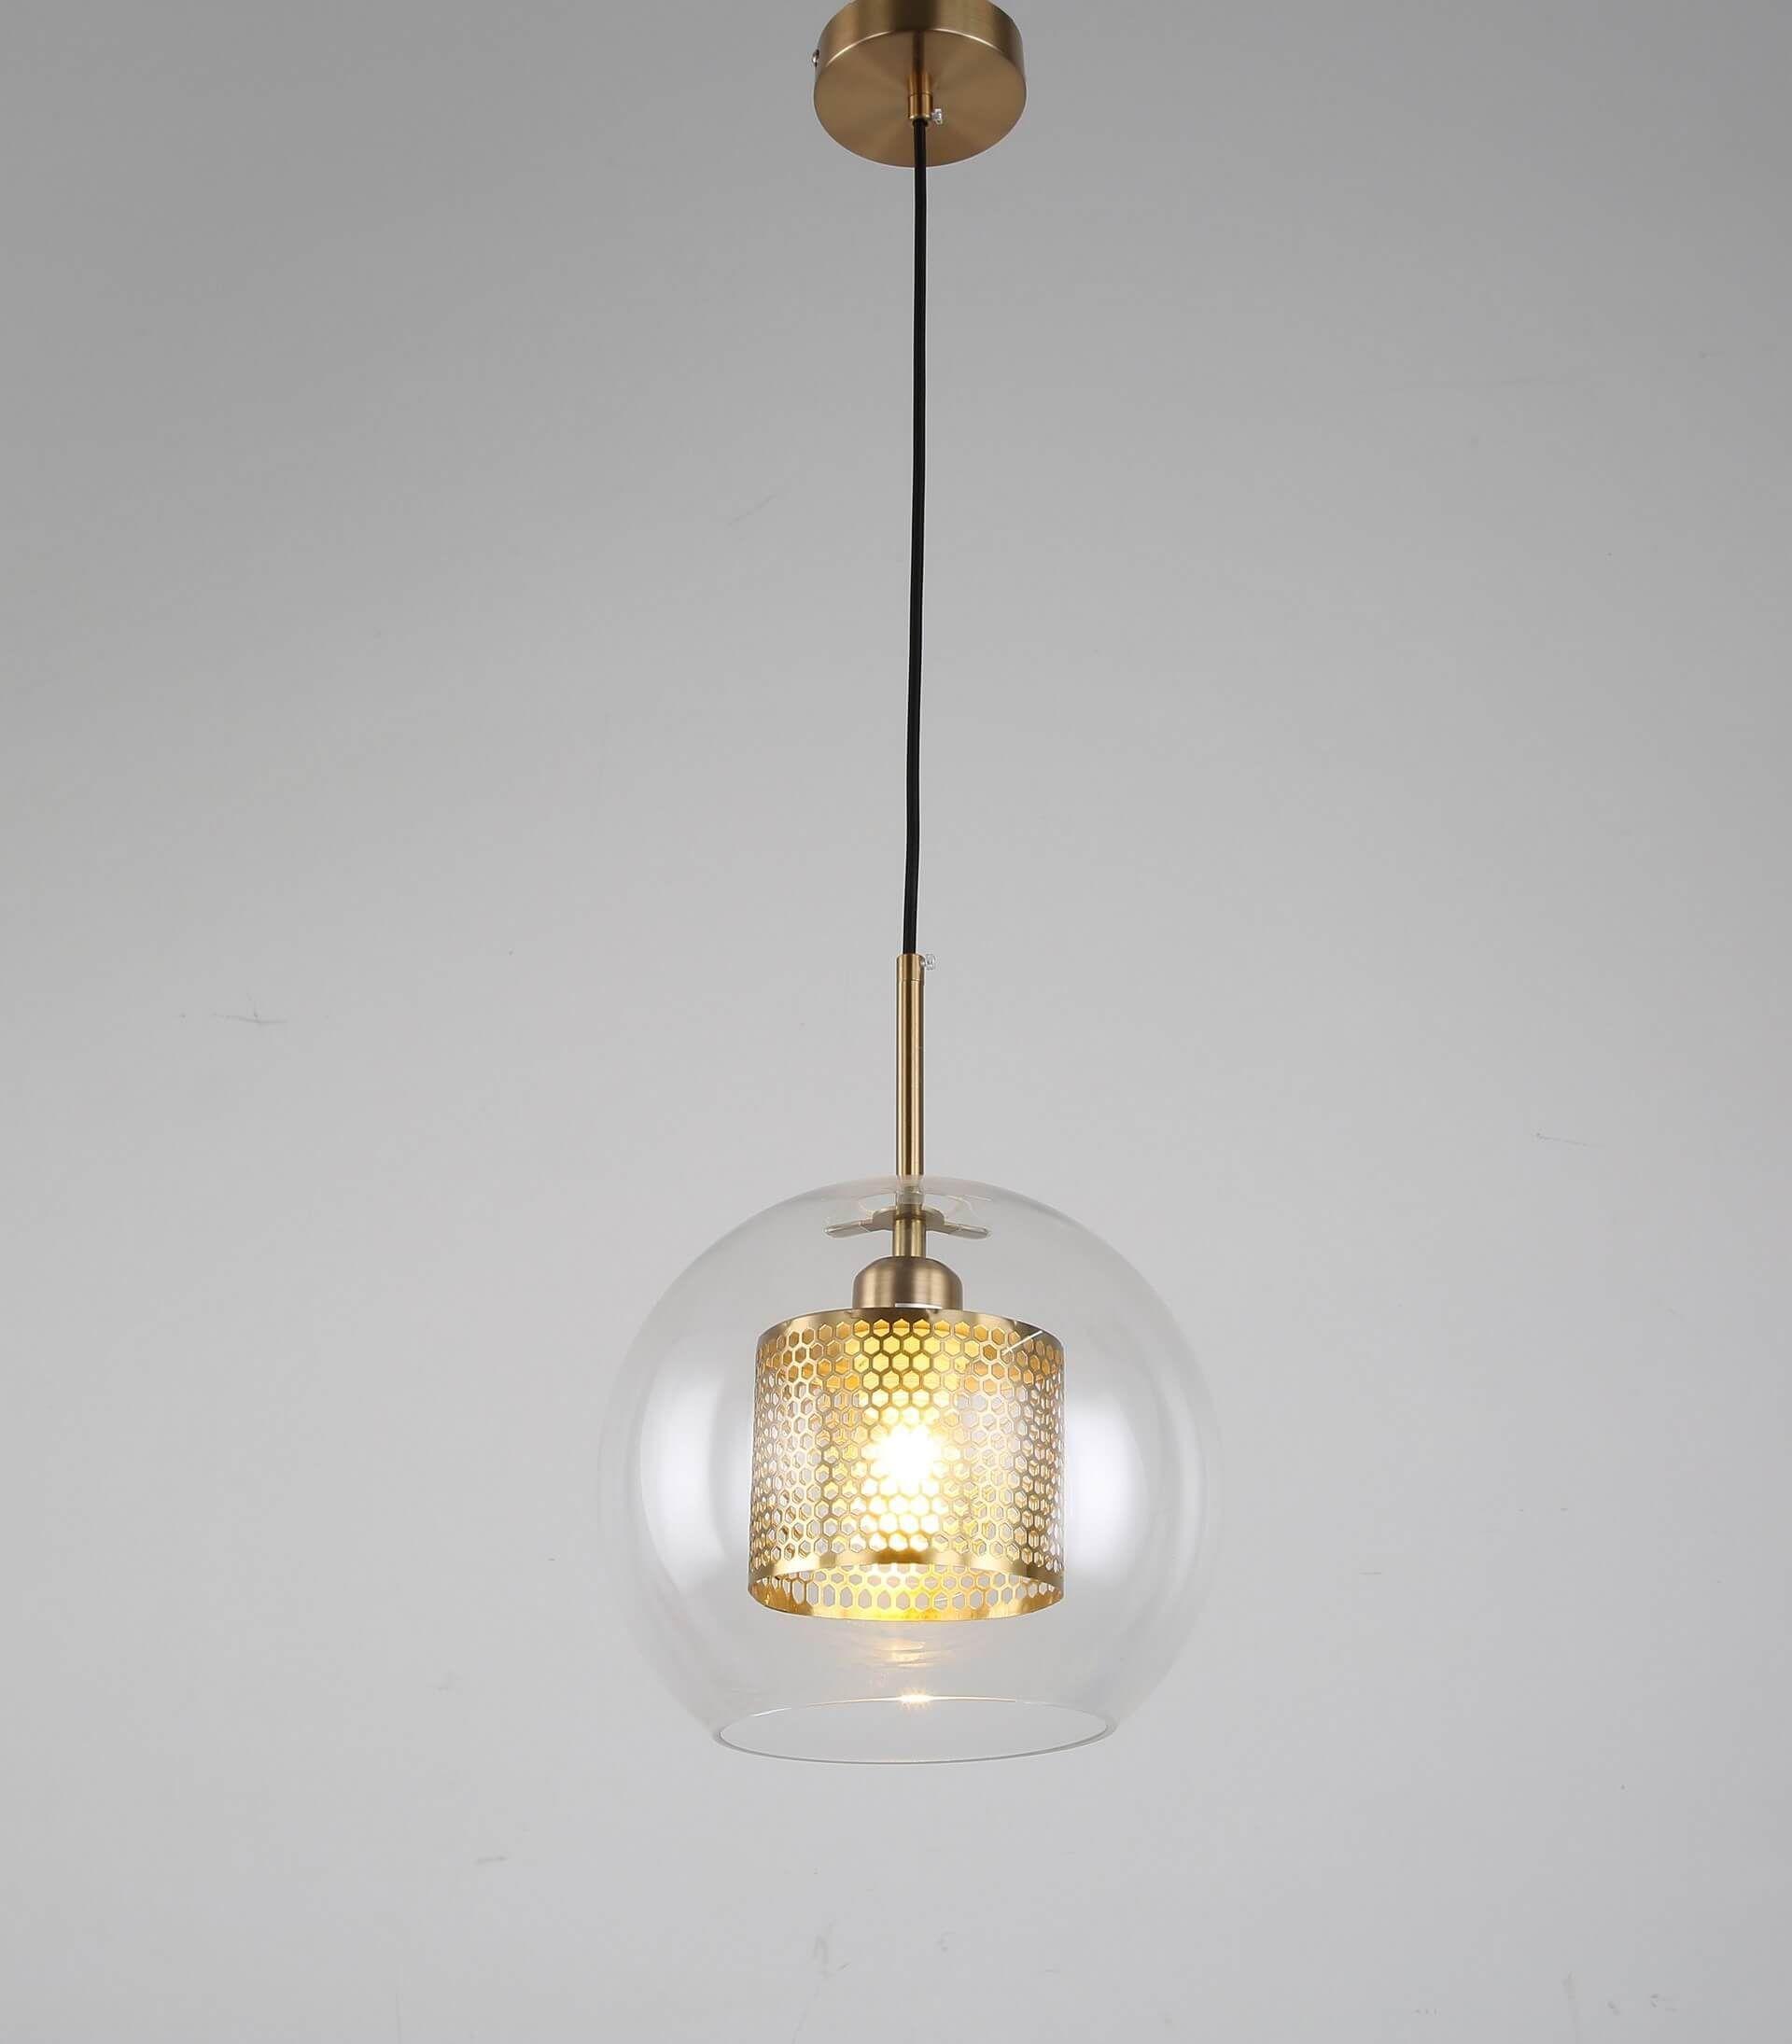 NOWOCZESNA LAMPA WISZĄCA MOSIĘŻNA PONTINA